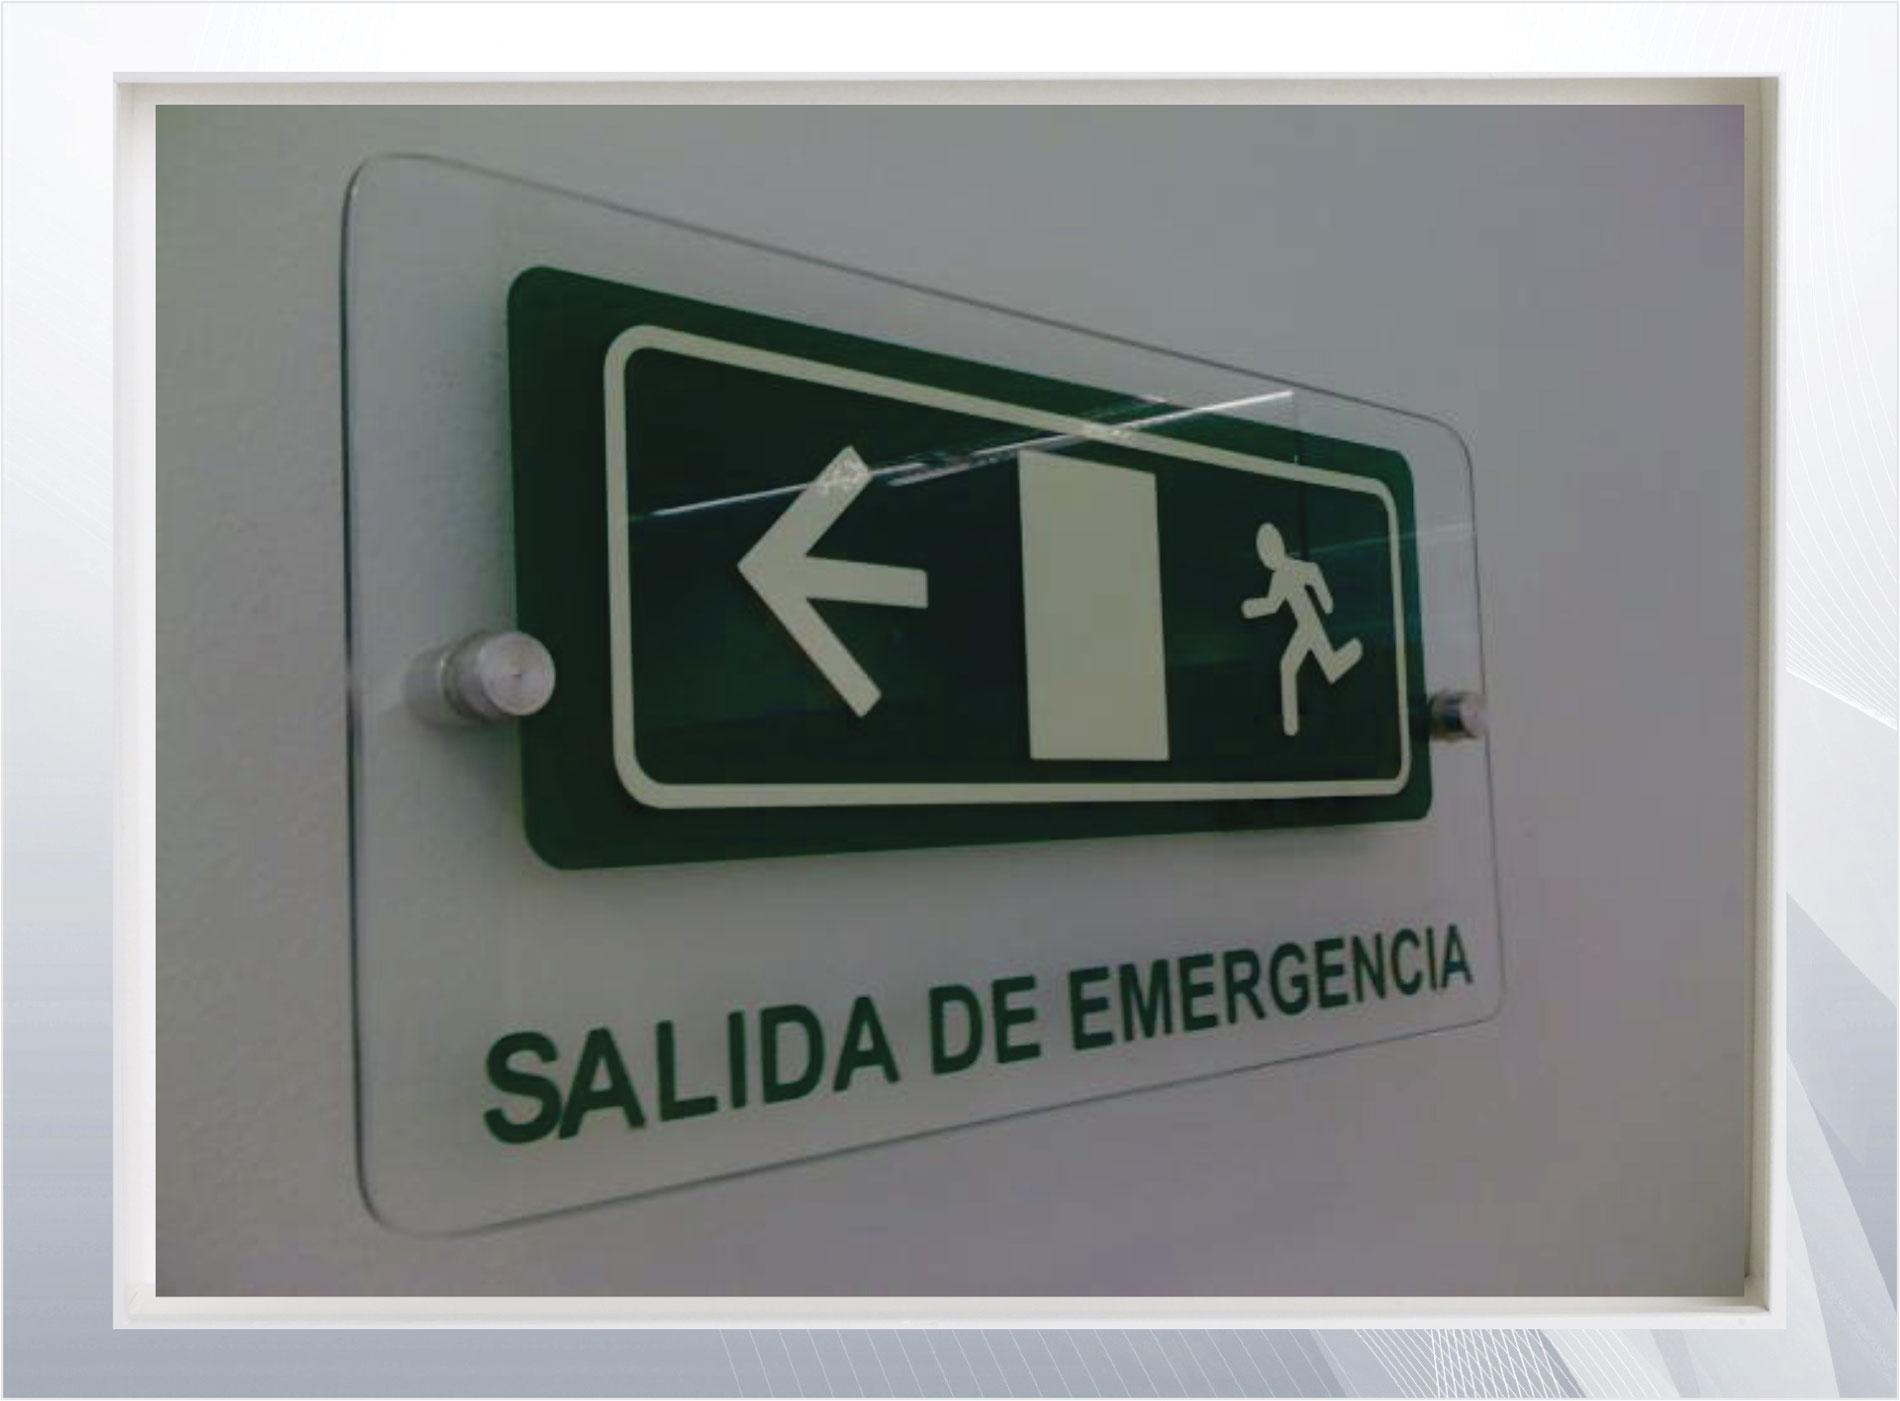 67_señal_seguridad_oficina_acrílico_vinilo_fotoluminiscente_ggcm